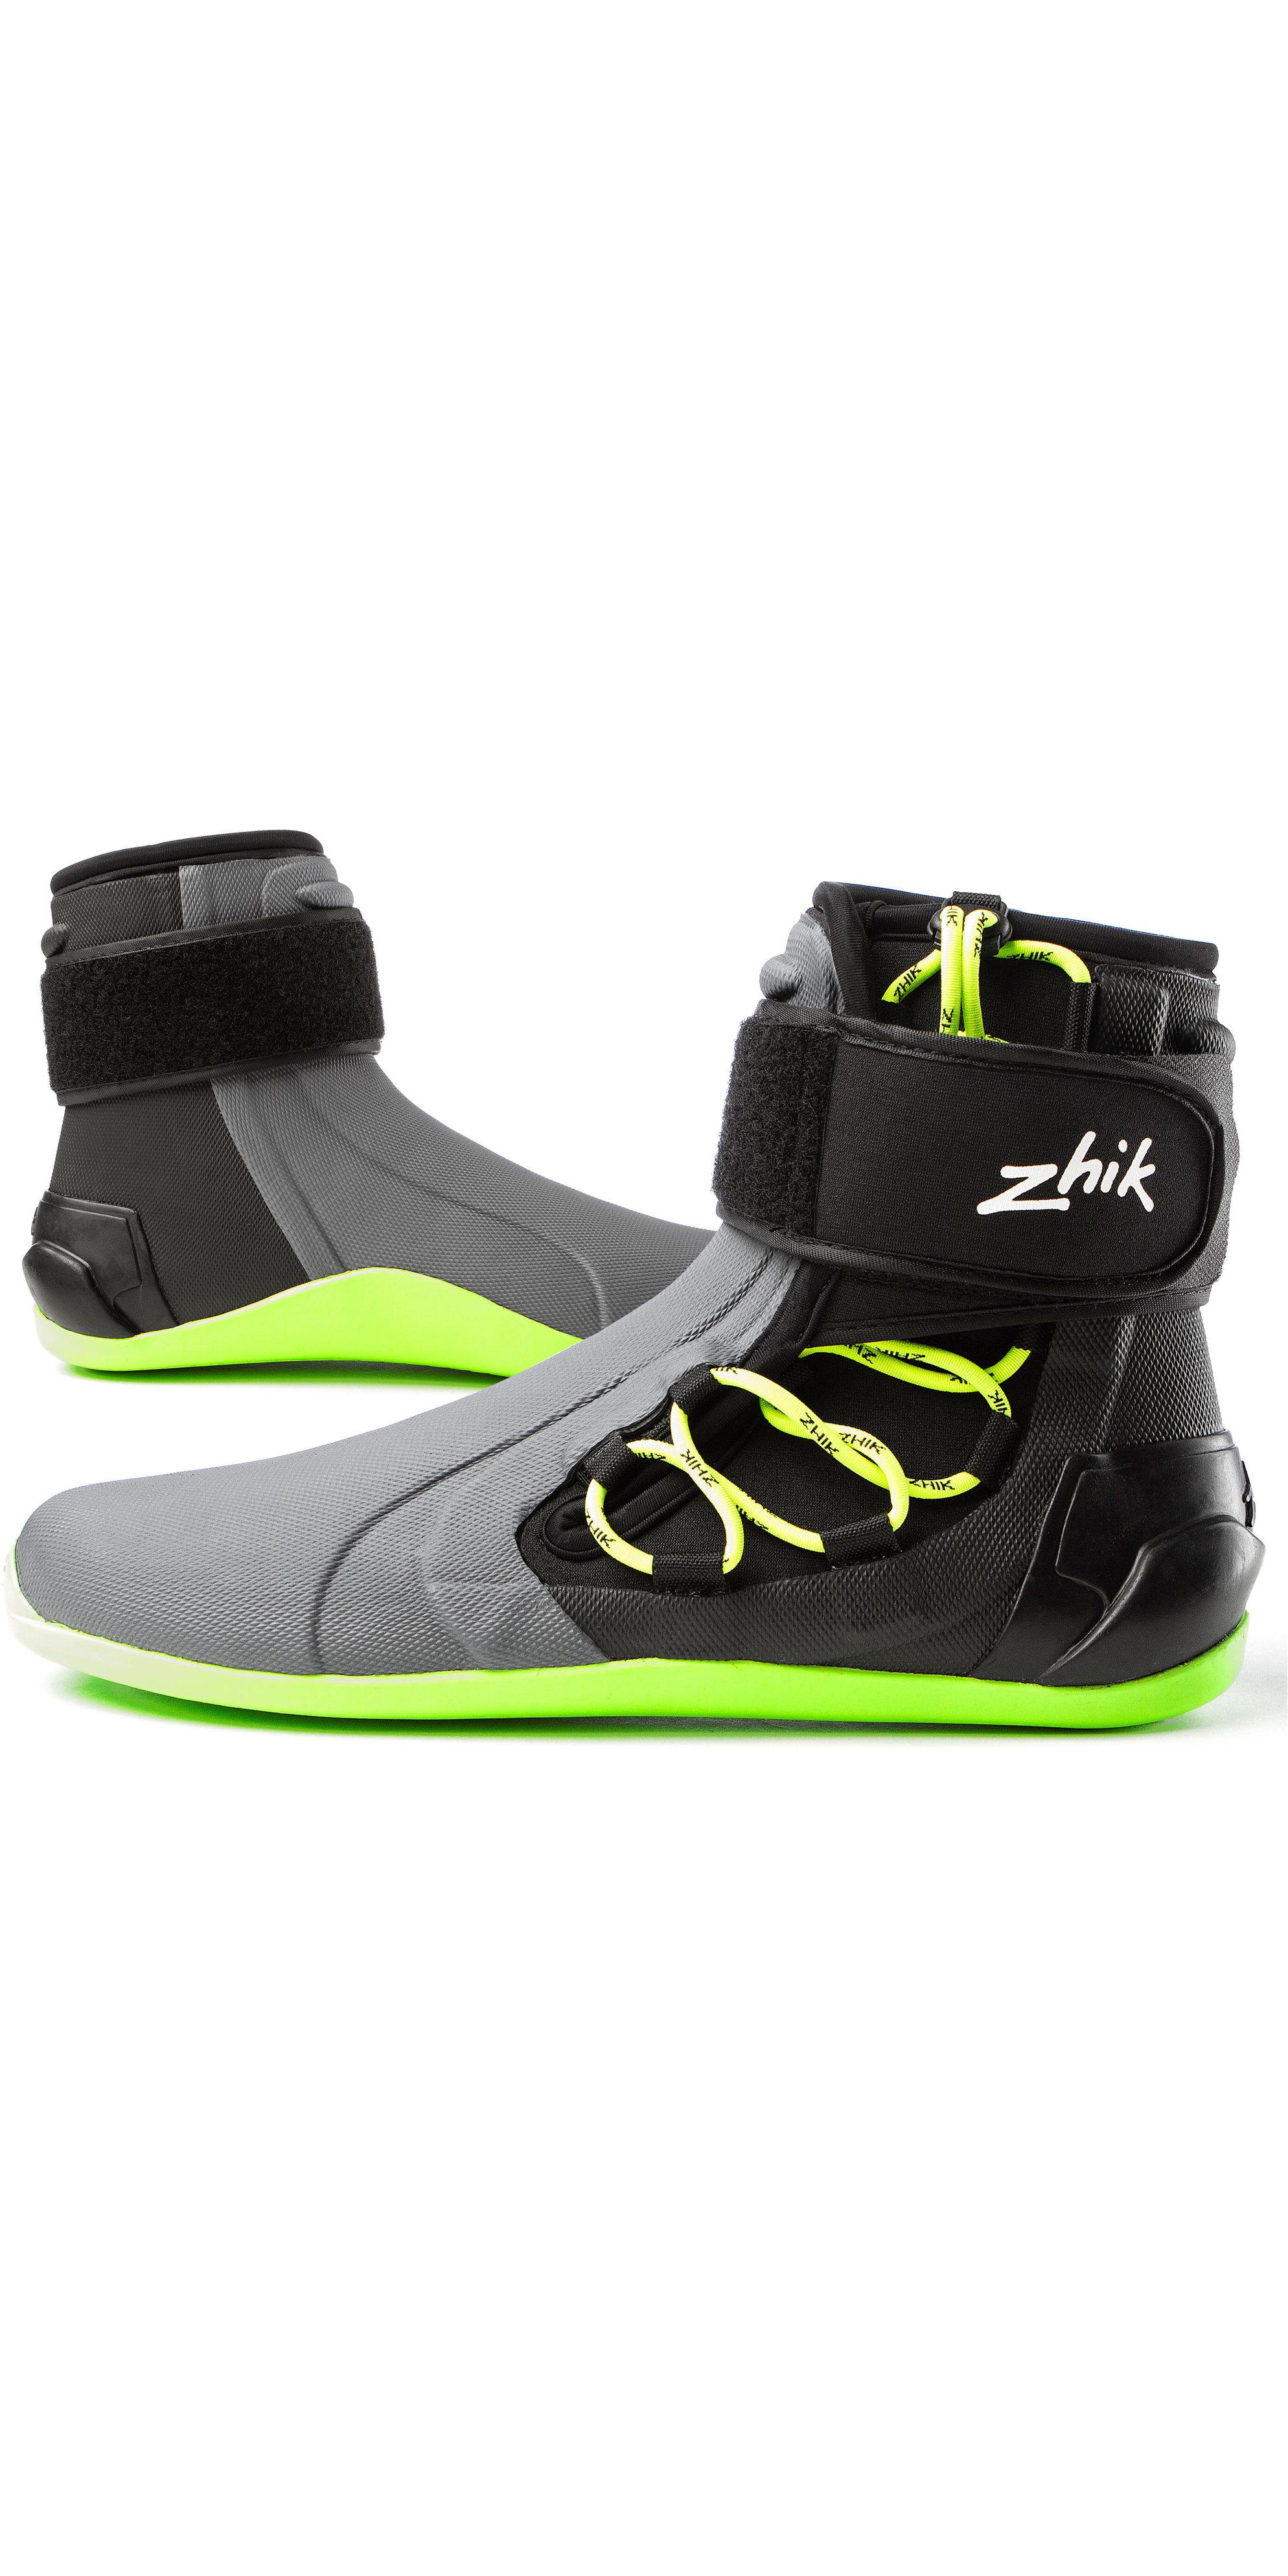 Zhik Superwarm Sailing Gloves 2019